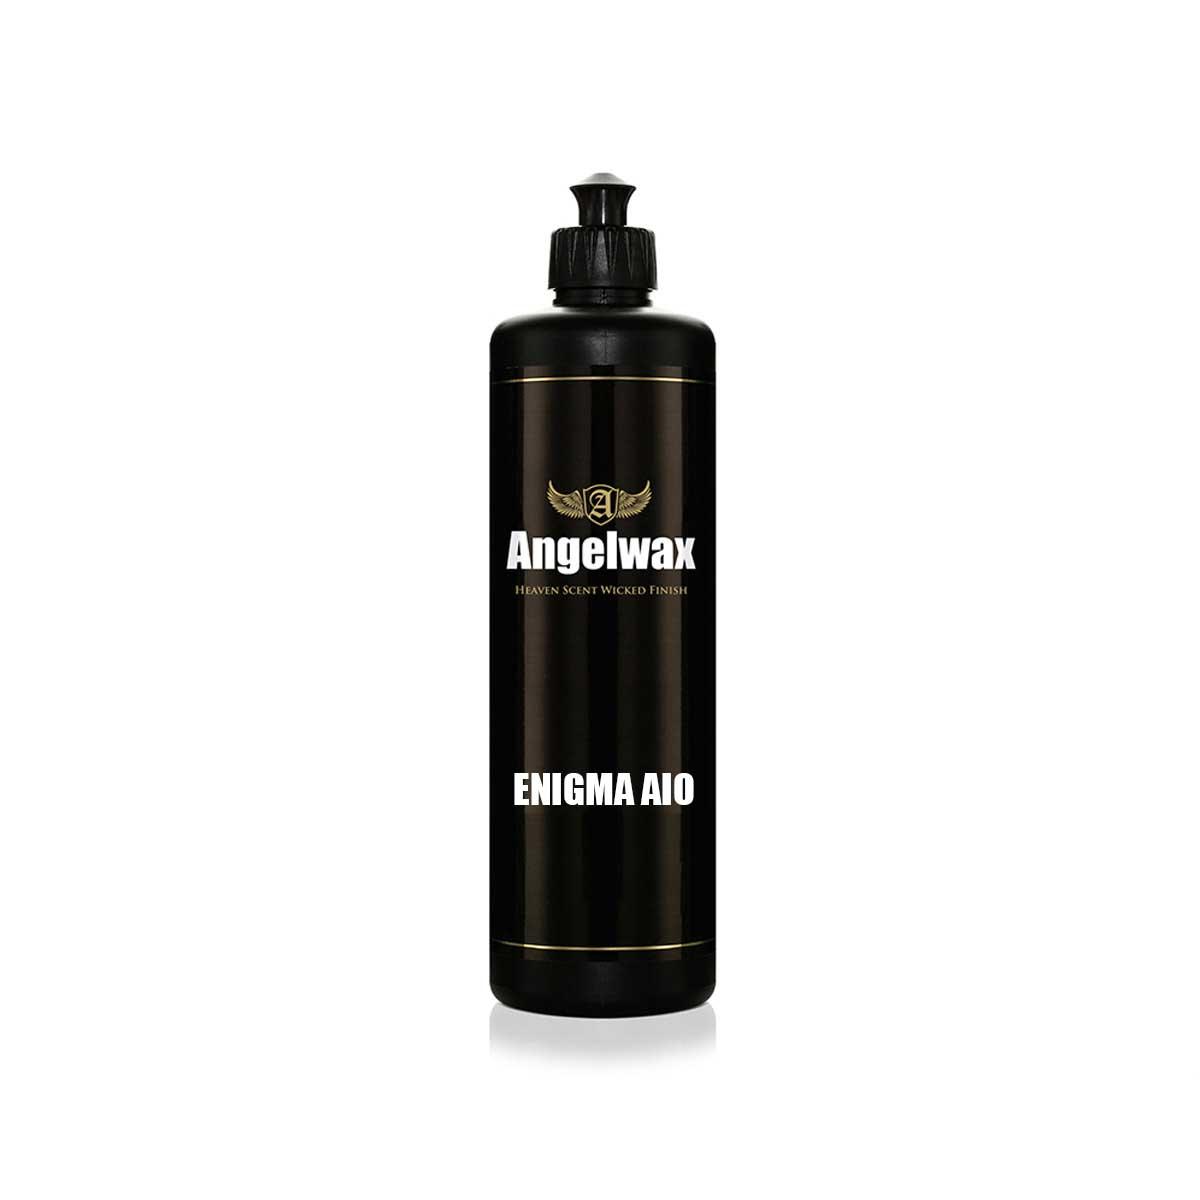 Polermedel Angelwax Enigma AIO, 1000 ml